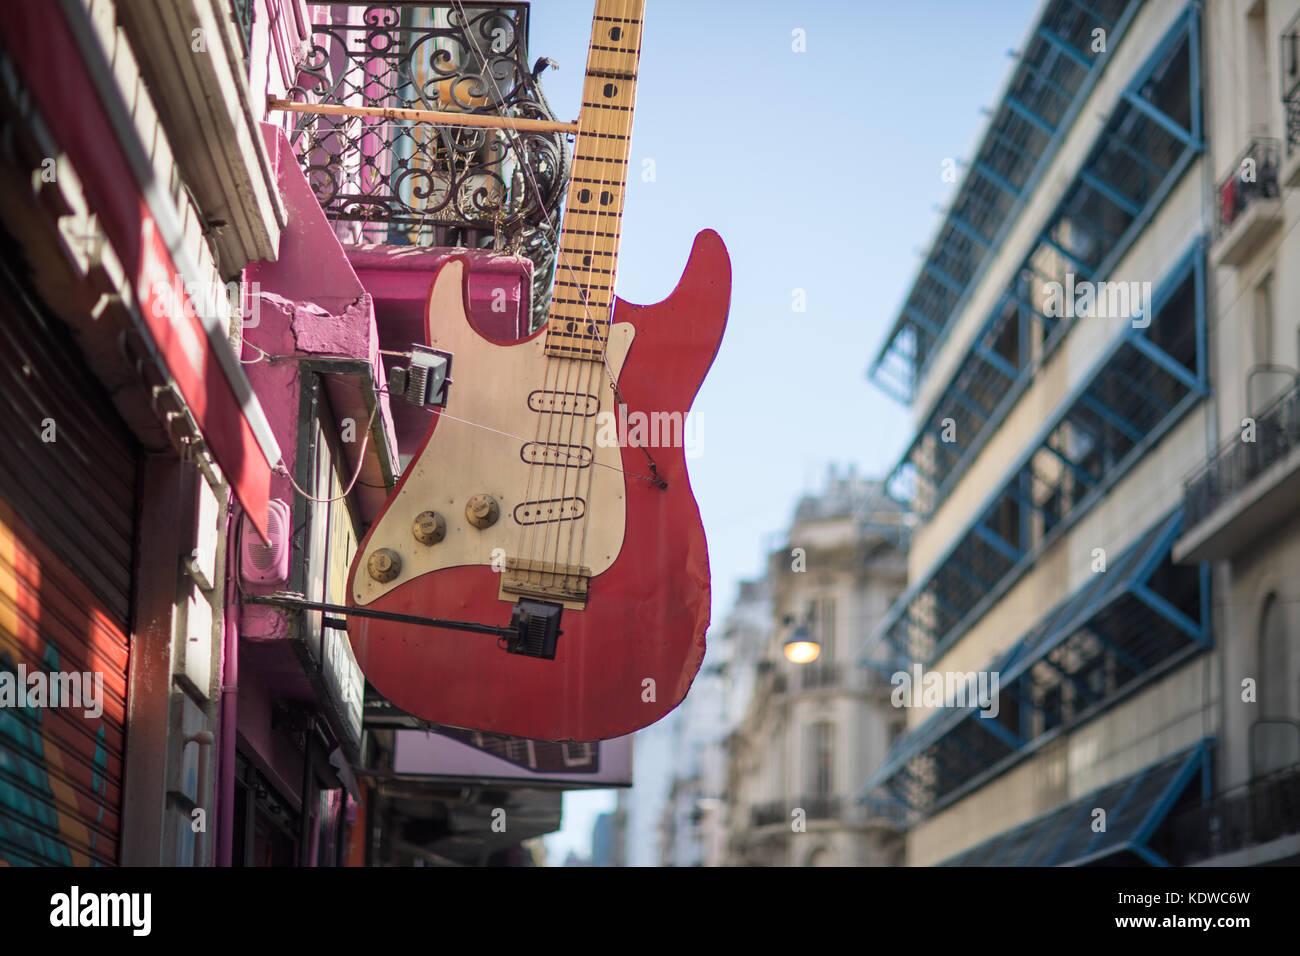 Guitar shop, Talcalhuano, Buenos Aires, Argentina Imagen De Stock